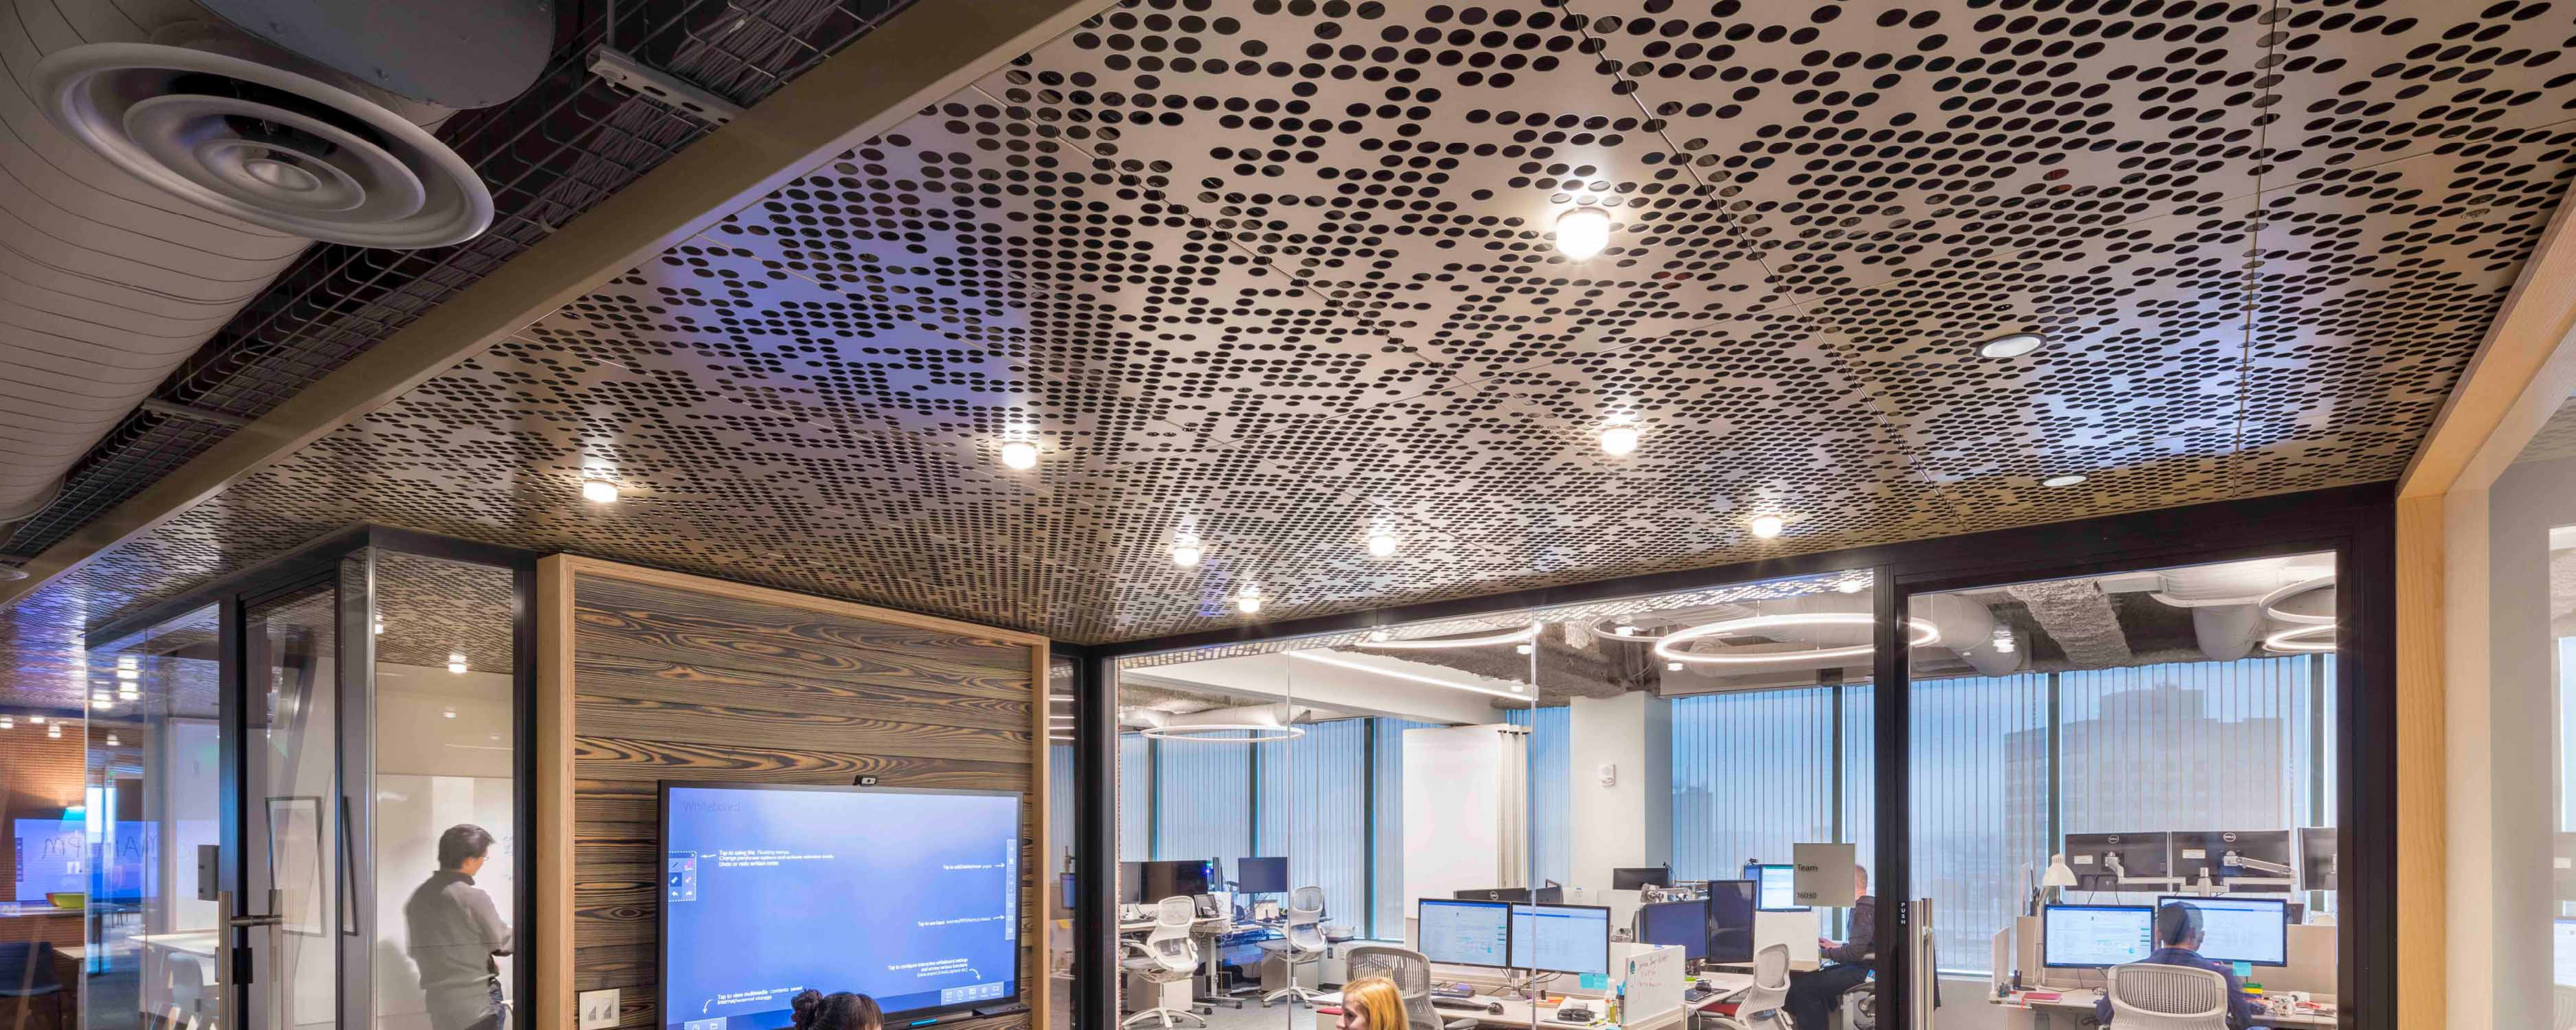 commercial kitchen ceiling tiles diy cabinet artistic suspended for